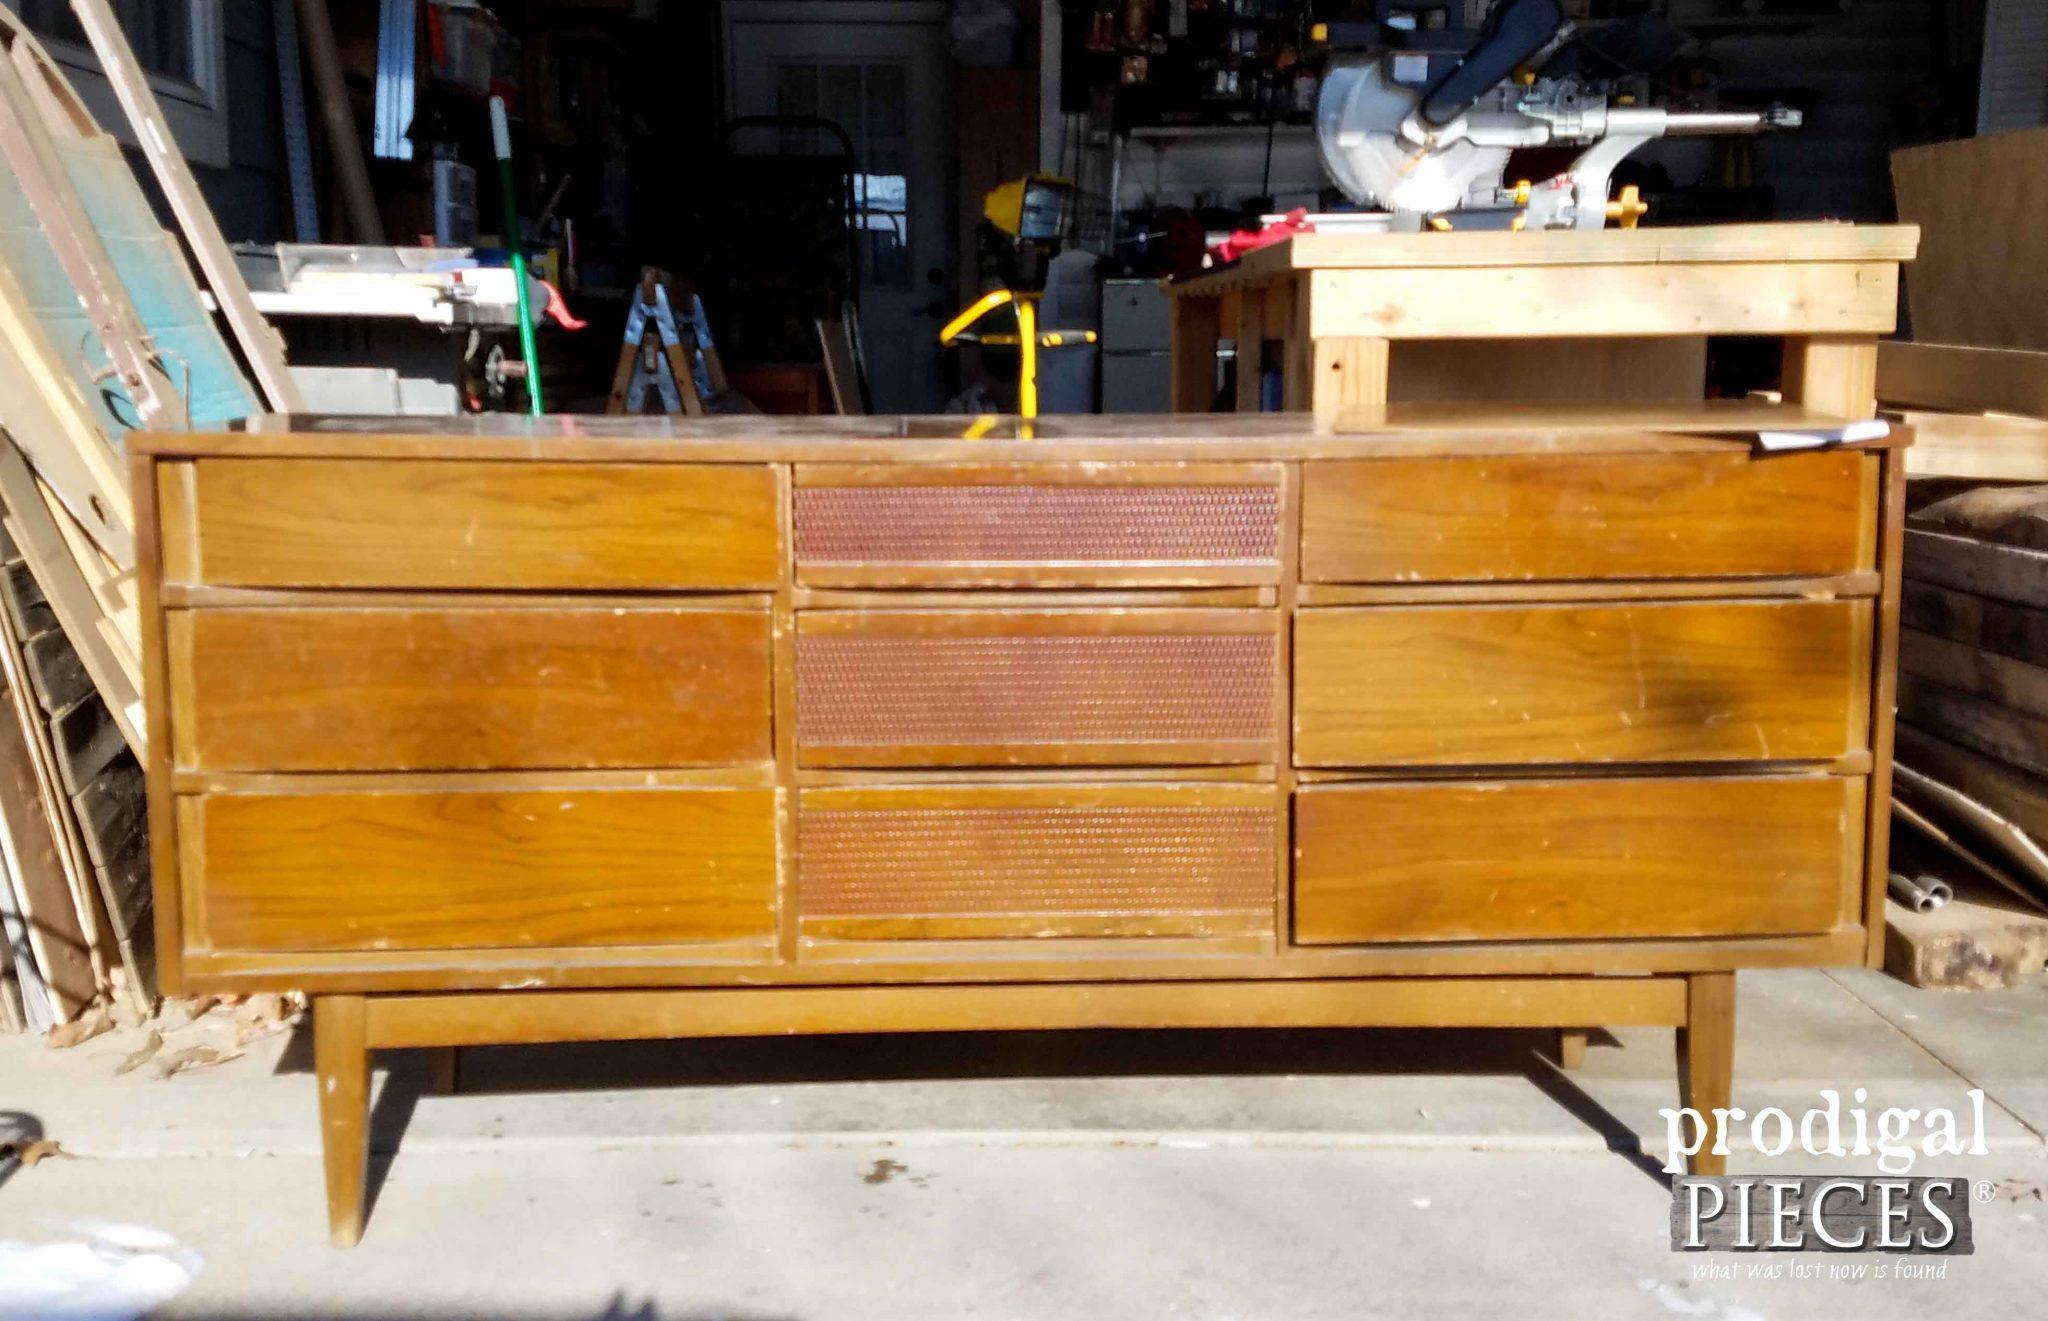 Mid century modern dresser found at thrift store by prodigal pieces prodigalpieces com